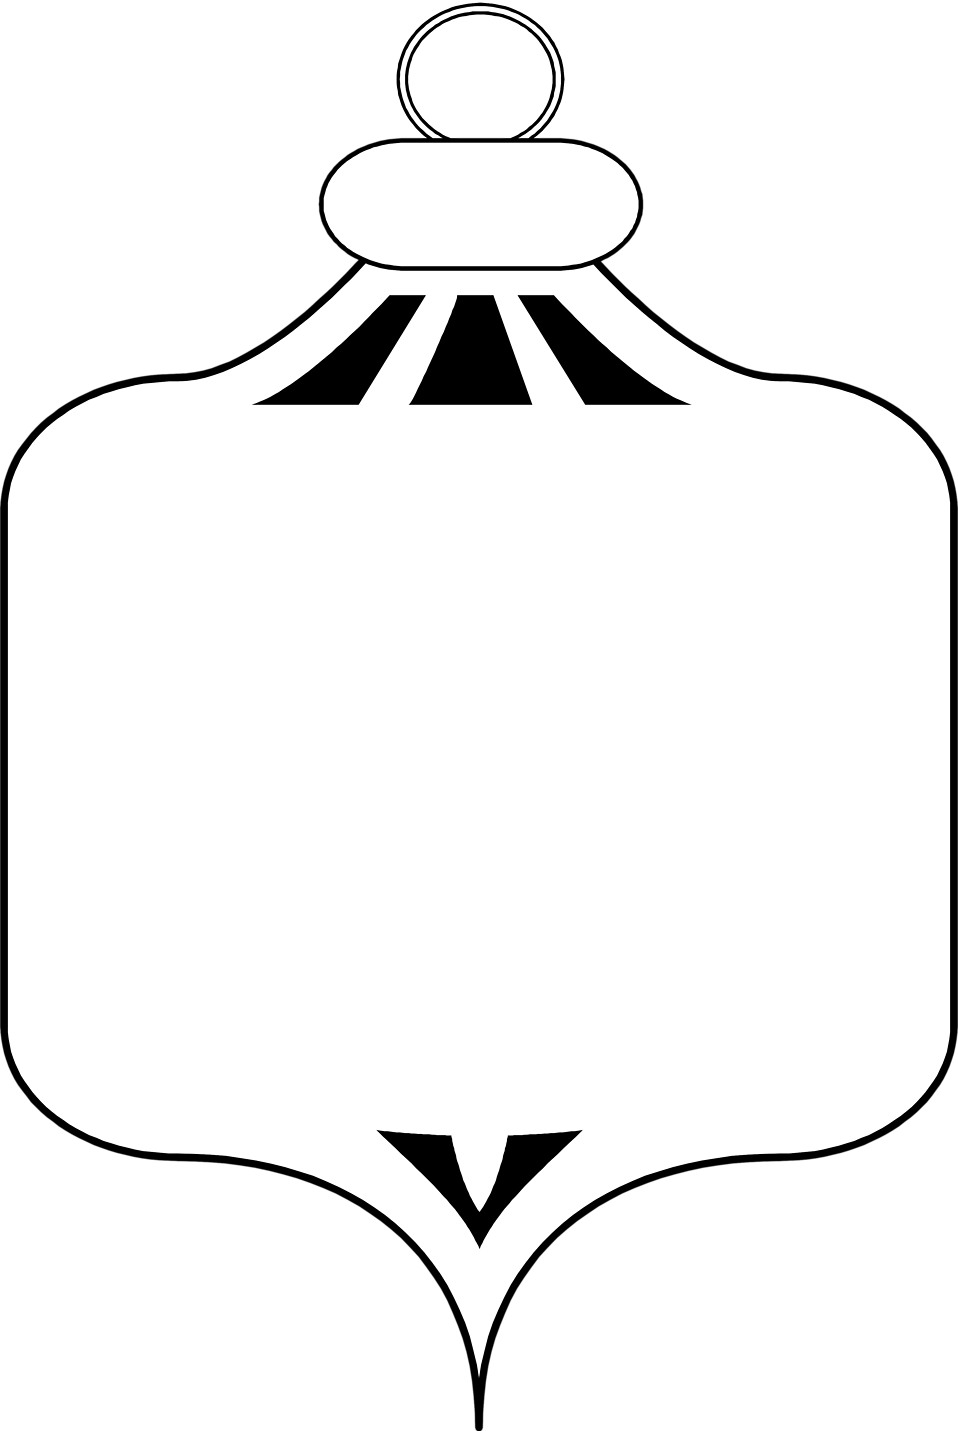 Free stock photo illustration. White clipart ornament